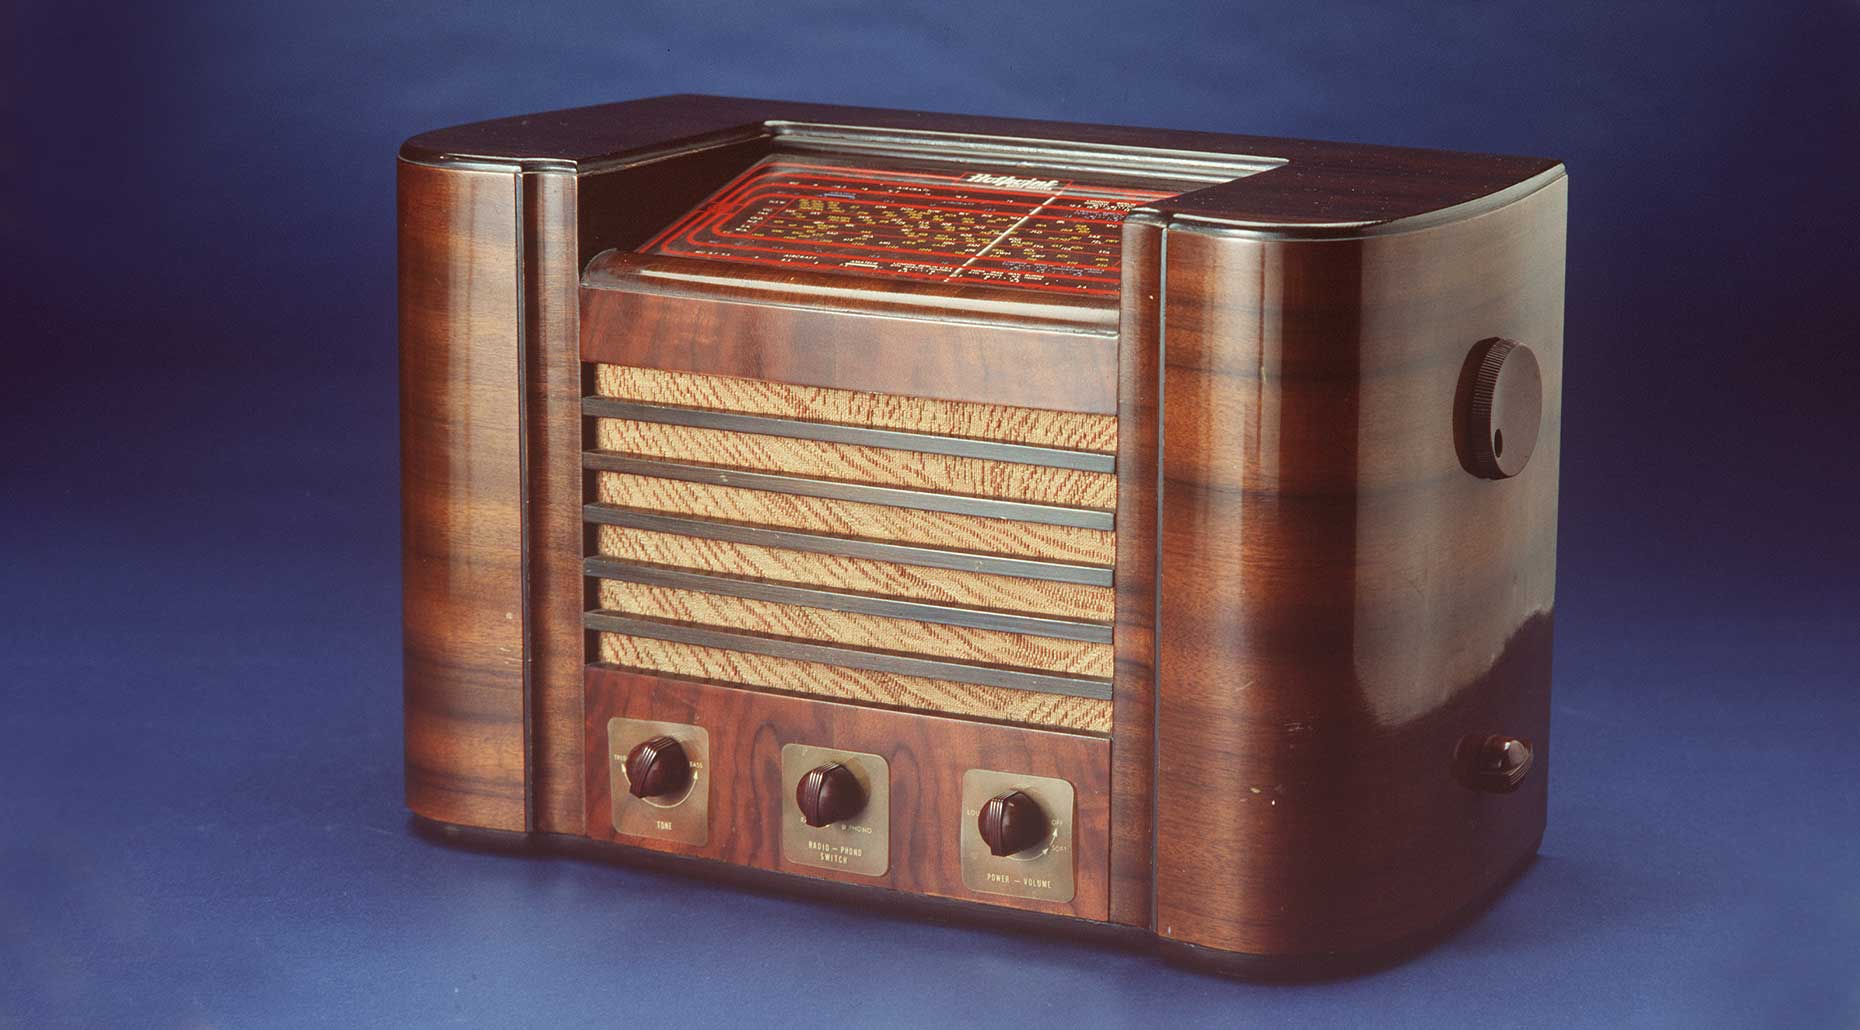 Hotpoint Bandmaster mantel radio, 1938, Australian General Electric, Australia. Powerhouse Collection.